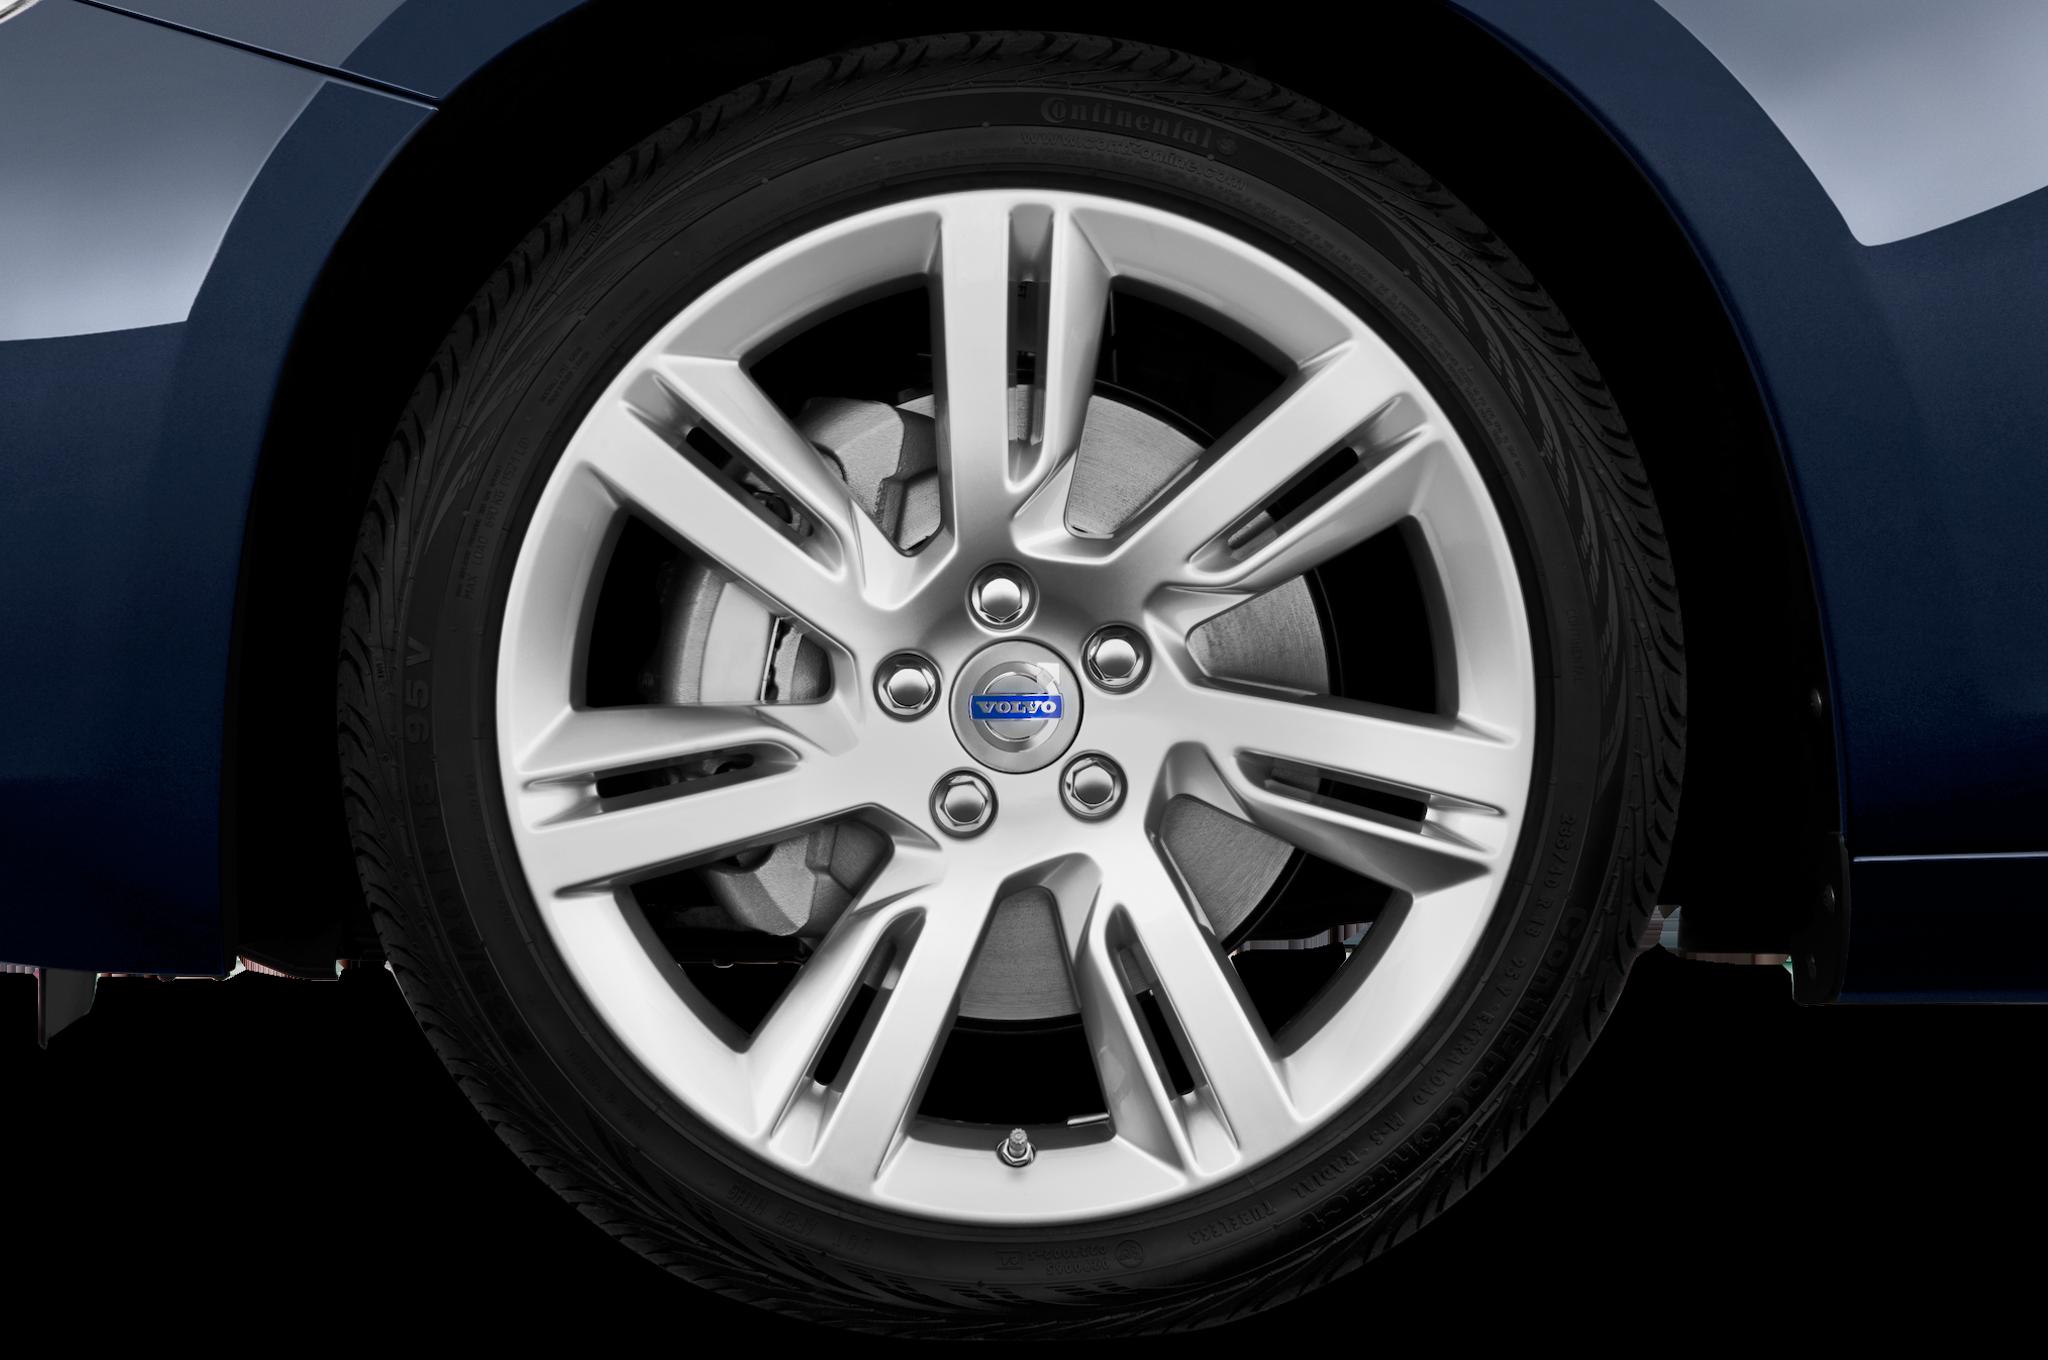 rims concept of wallpaper polestar htm picture volvo wheels